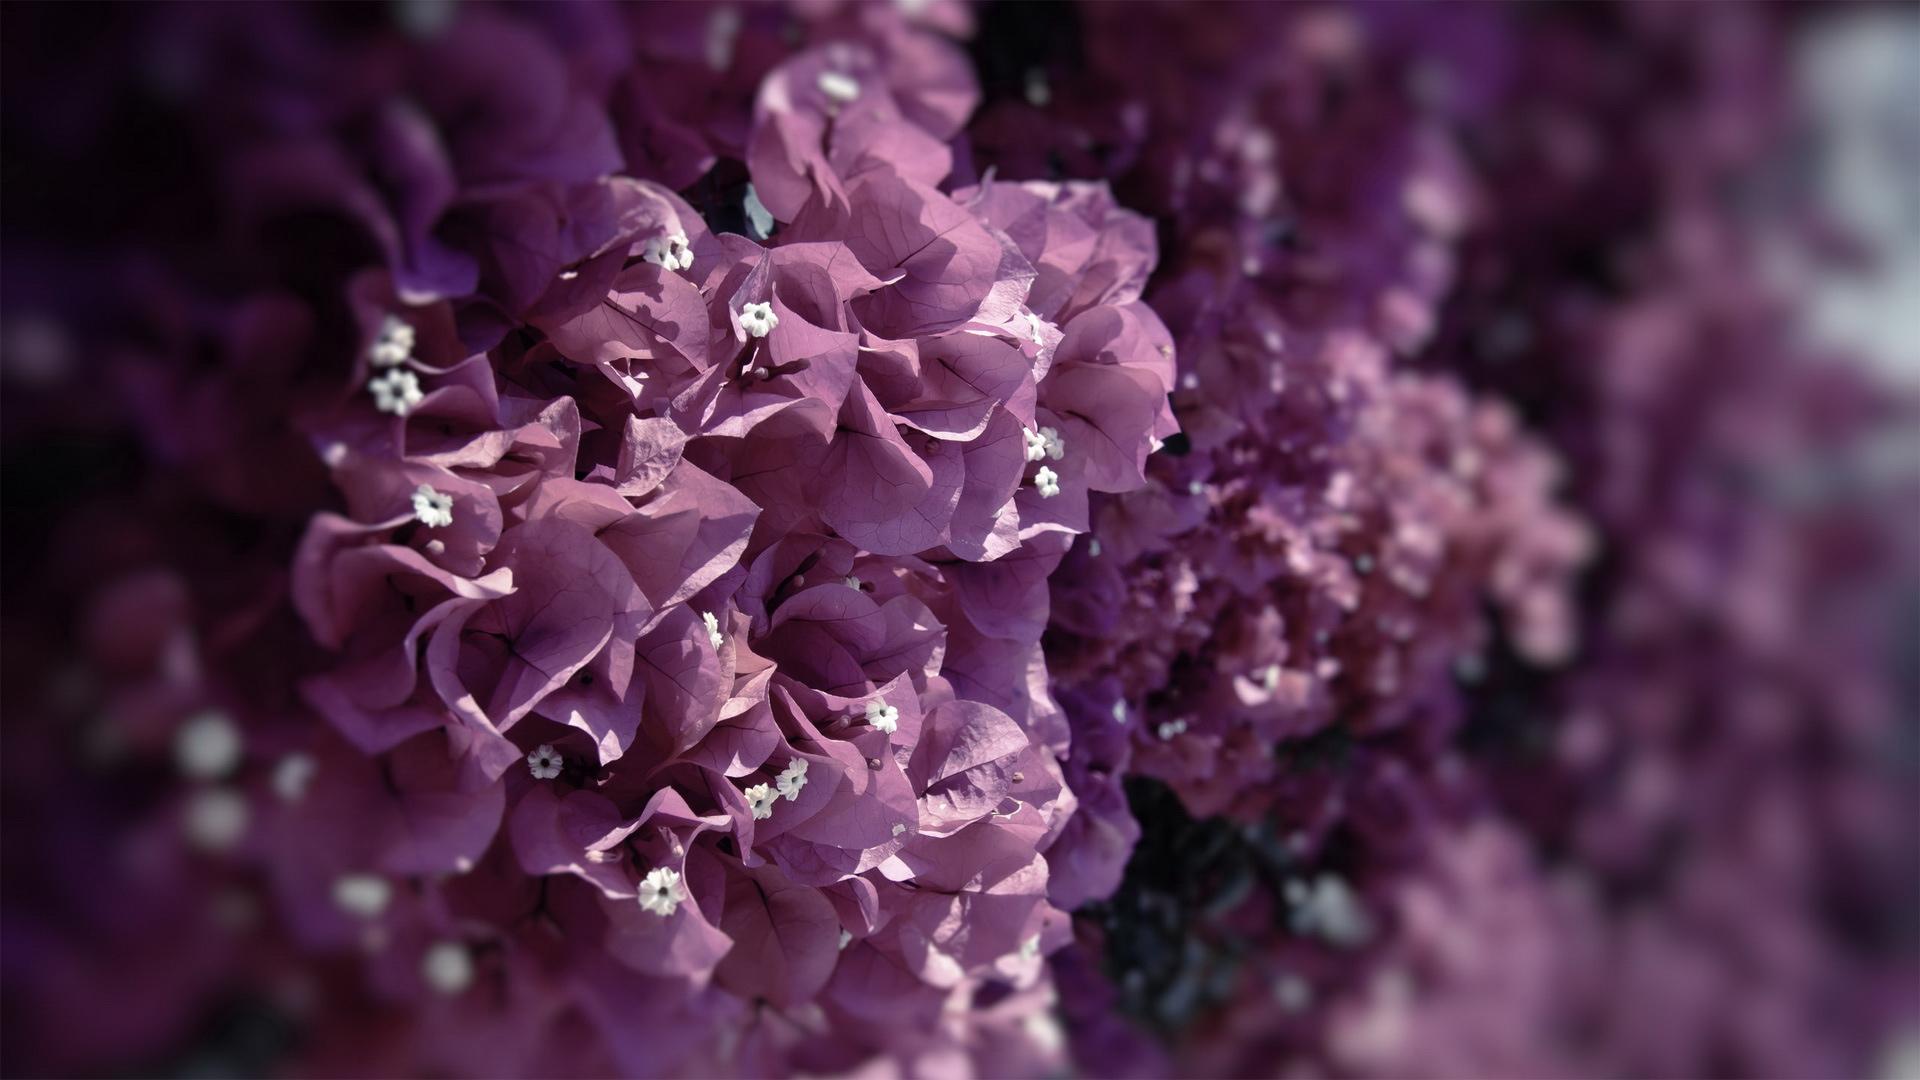 Rama 3d Name Wallpapers Beautiful Flower Dandelion Hd Desktop Wallpapers 4k Hd